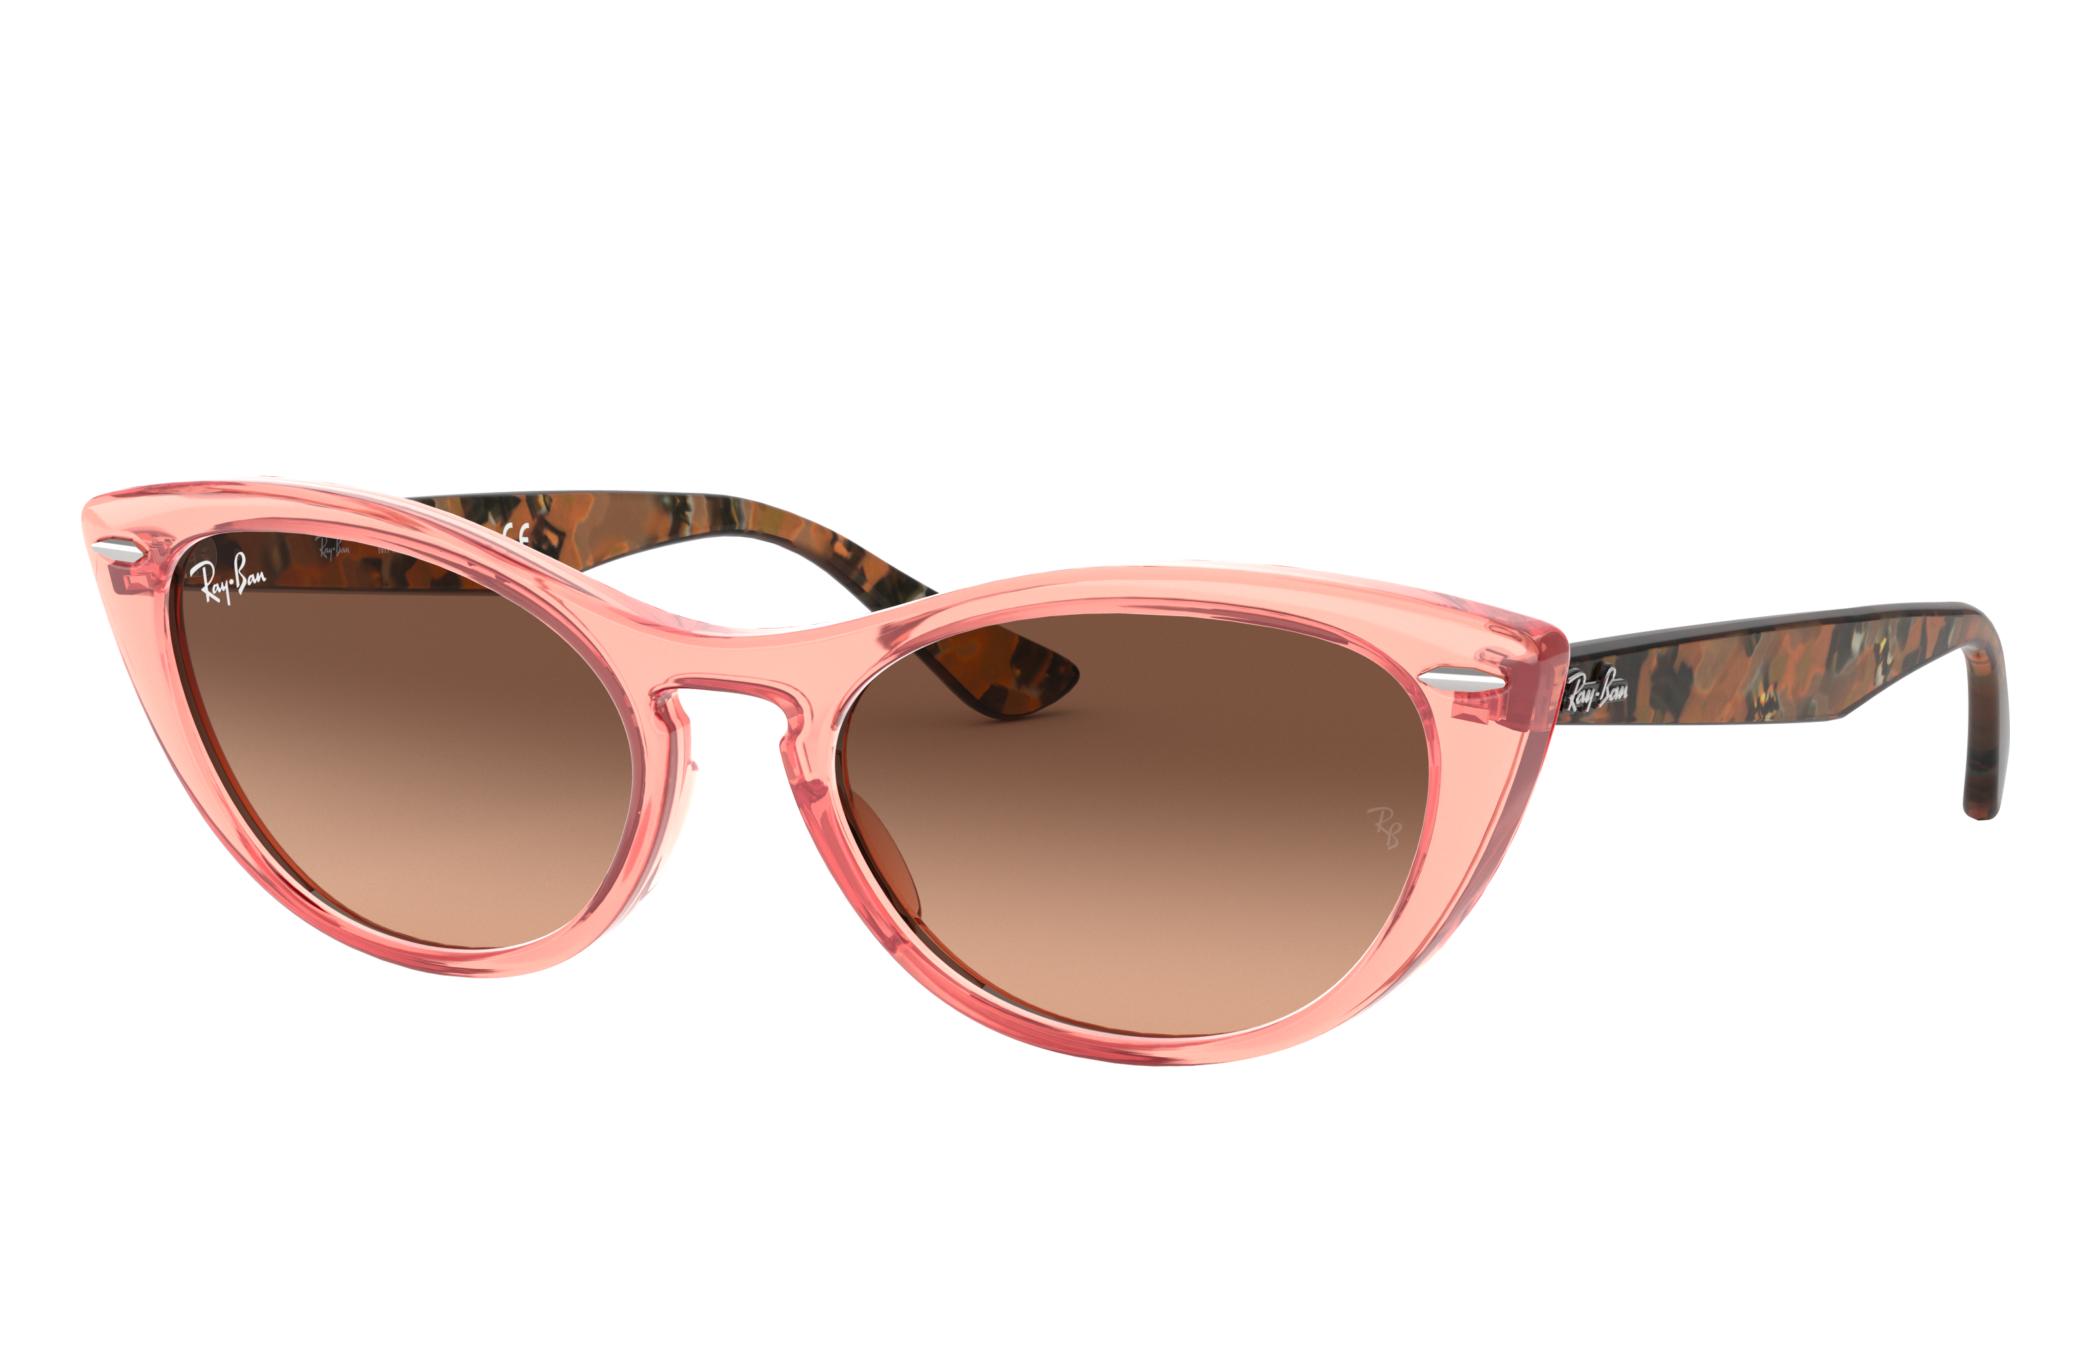 Ray-Ban Nina Brown Havana, Pink Lenses - RB4314N